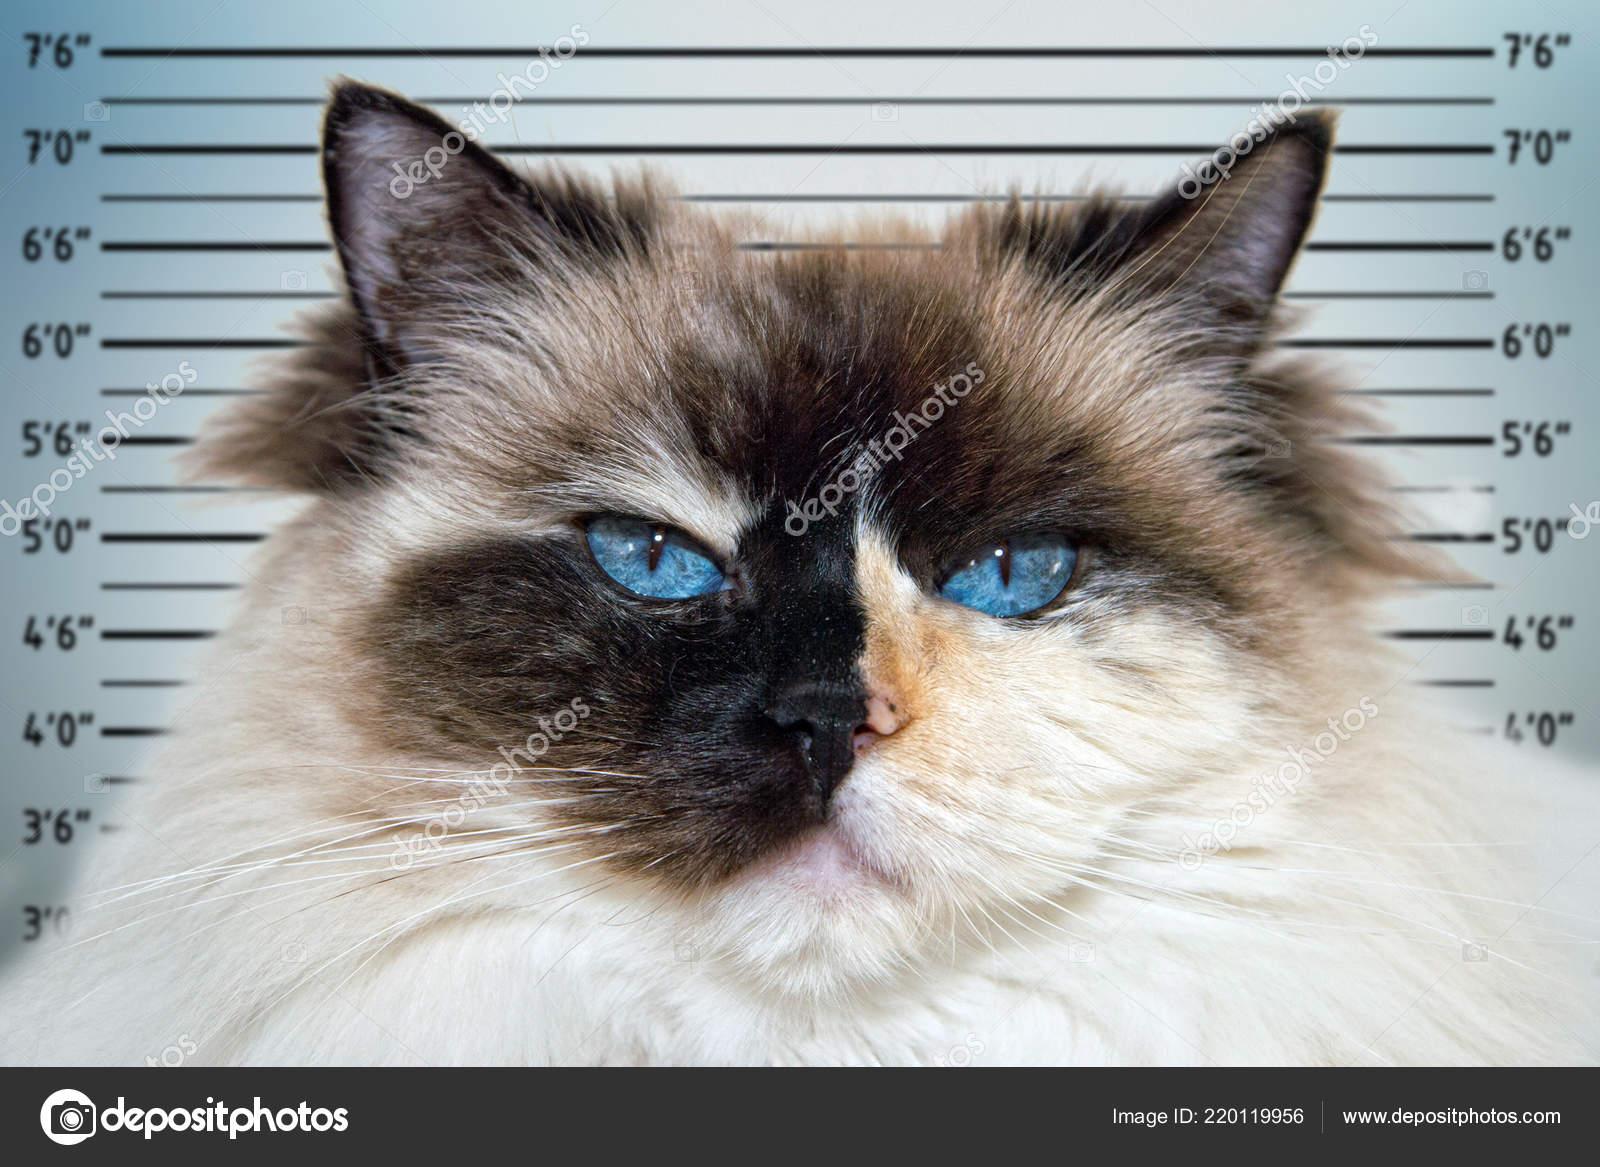 Blue Eyes White Black Ragdoll Cat Portrait Police Mugshot Line Stock Photo C Izanbar 220119956